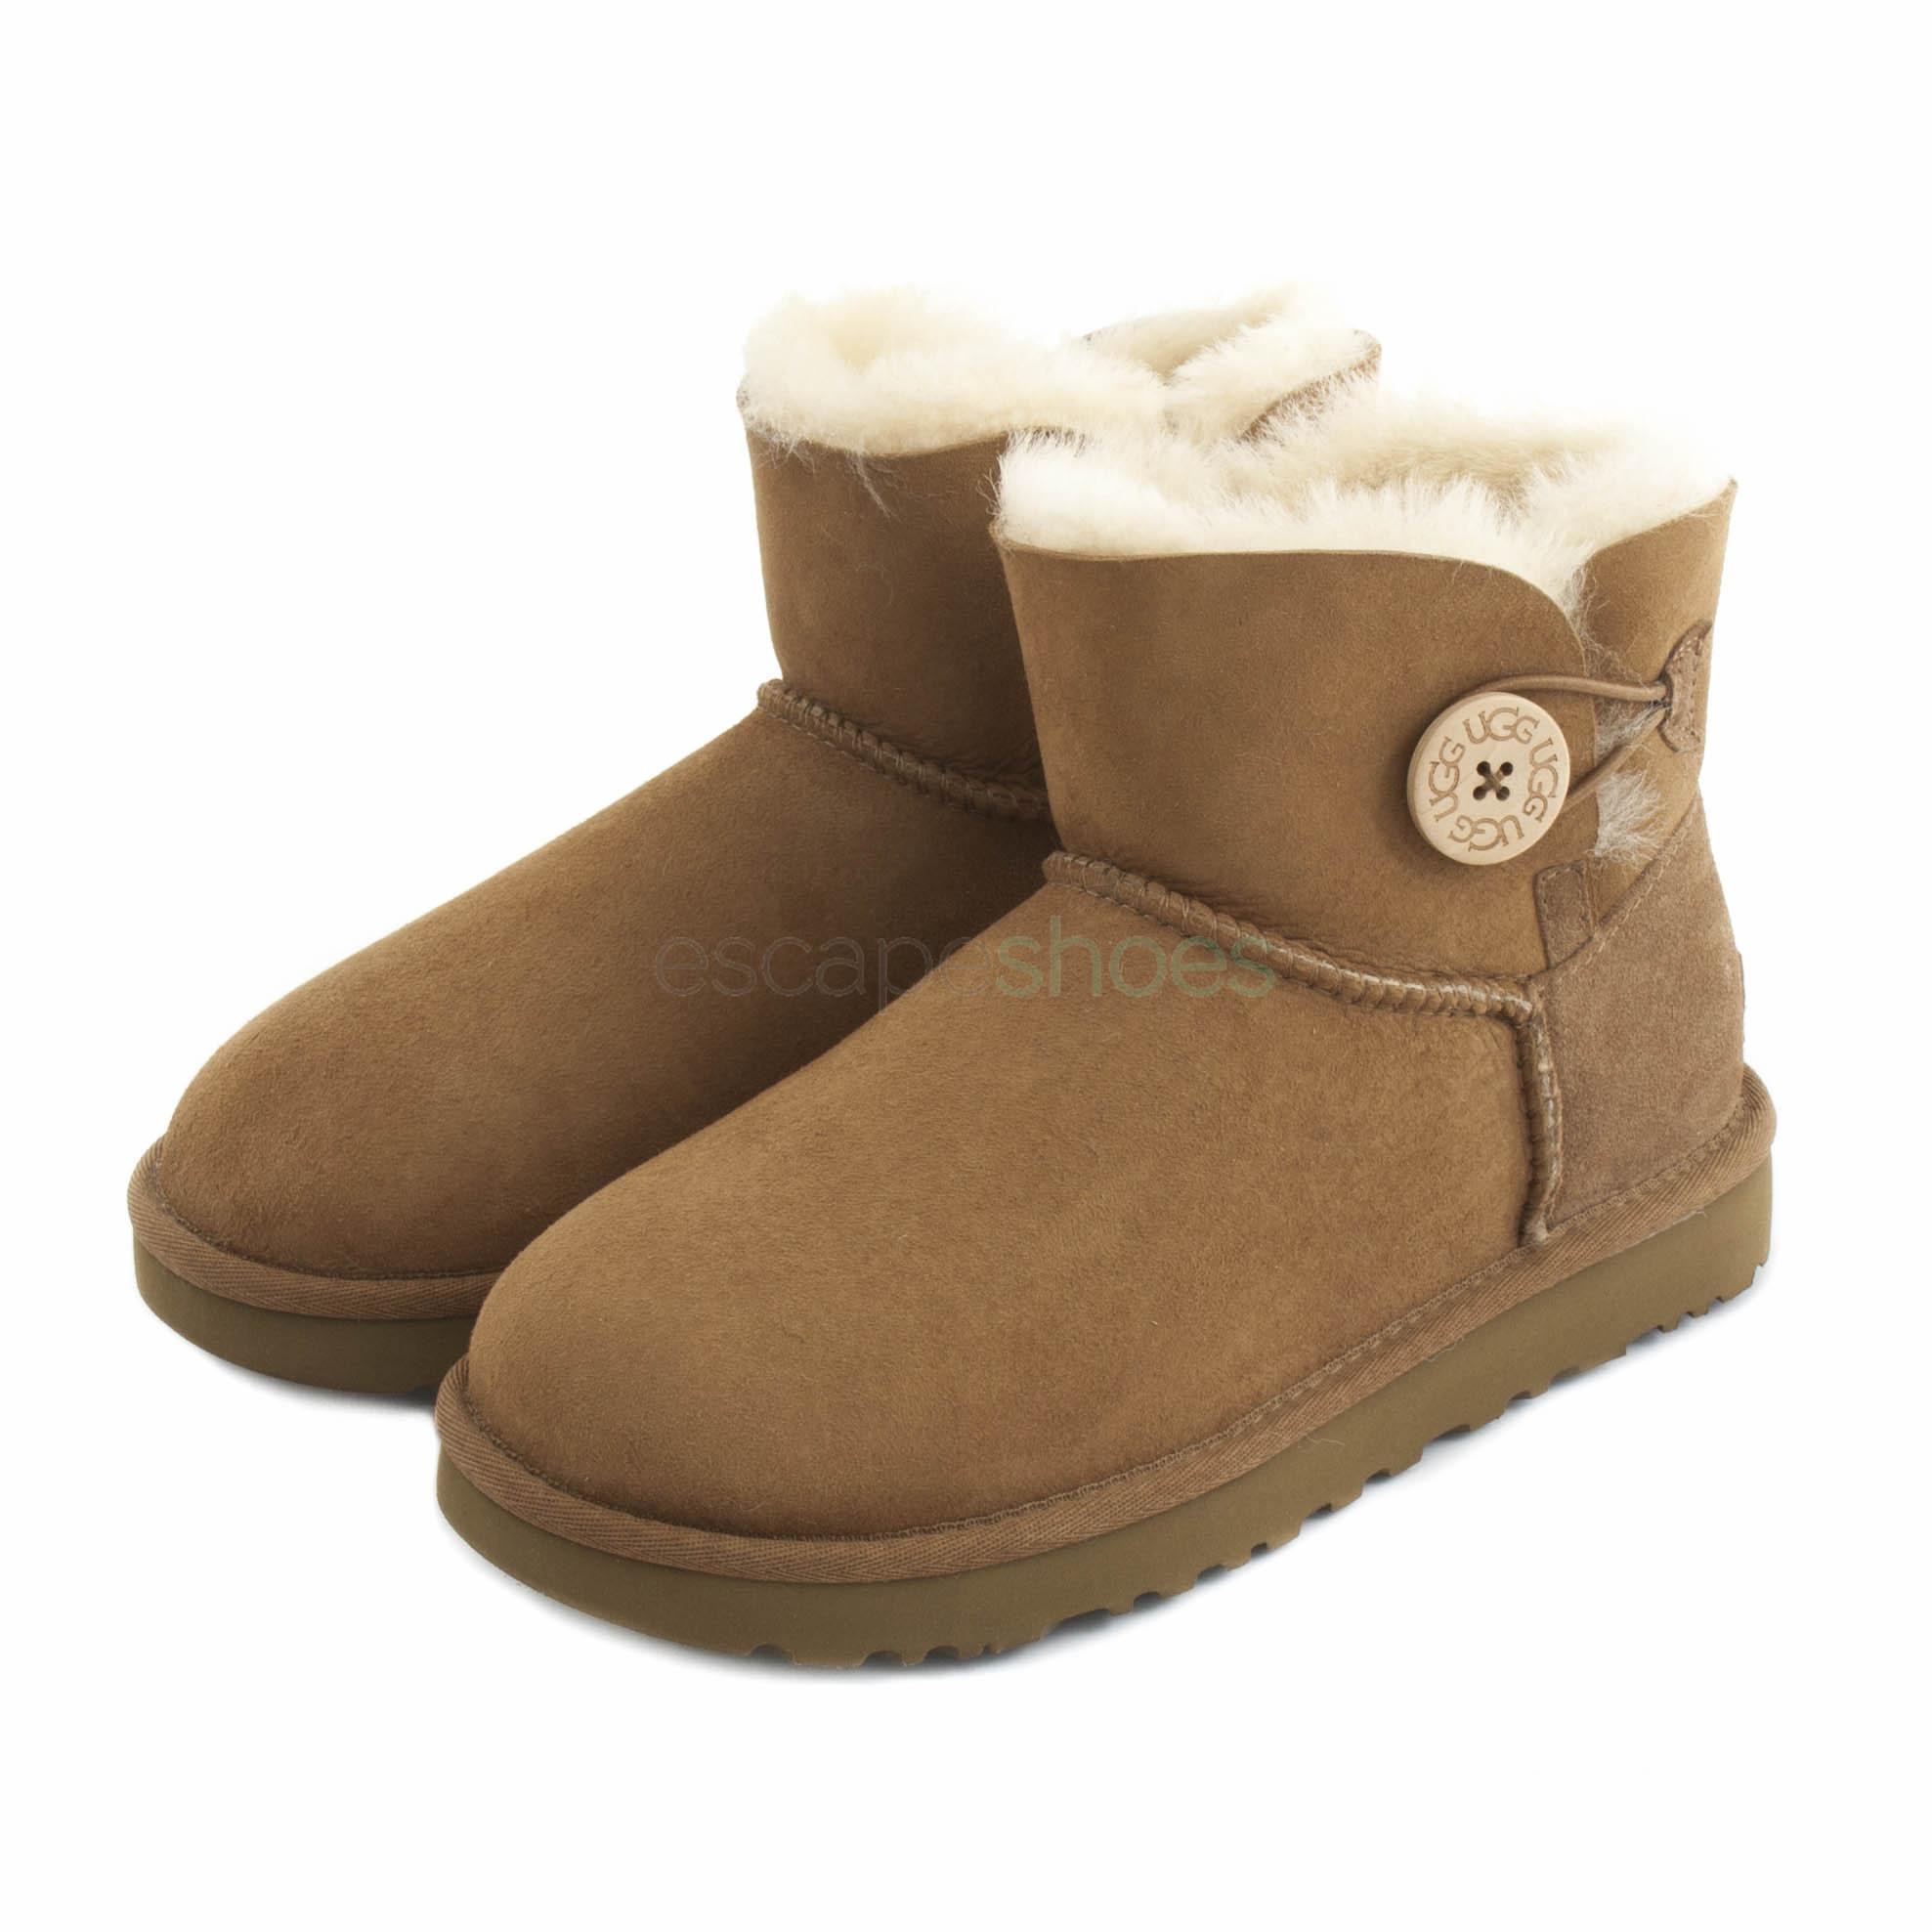 a1f29eaa0b4 Boots UGG Australia Mini Bailey Button II Brown